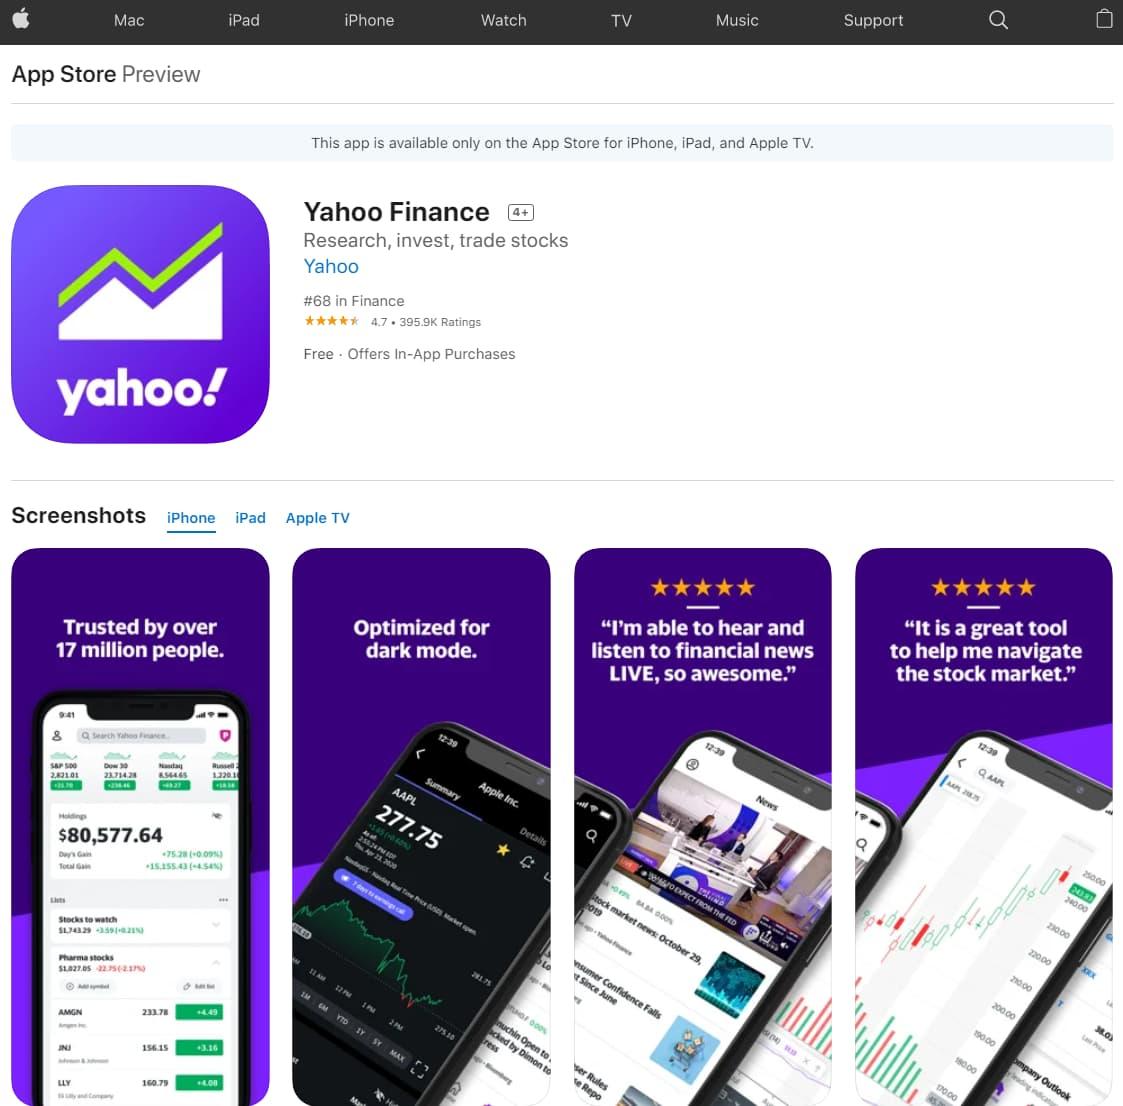 Best Stock Tracking App iPhone: yahoo finance